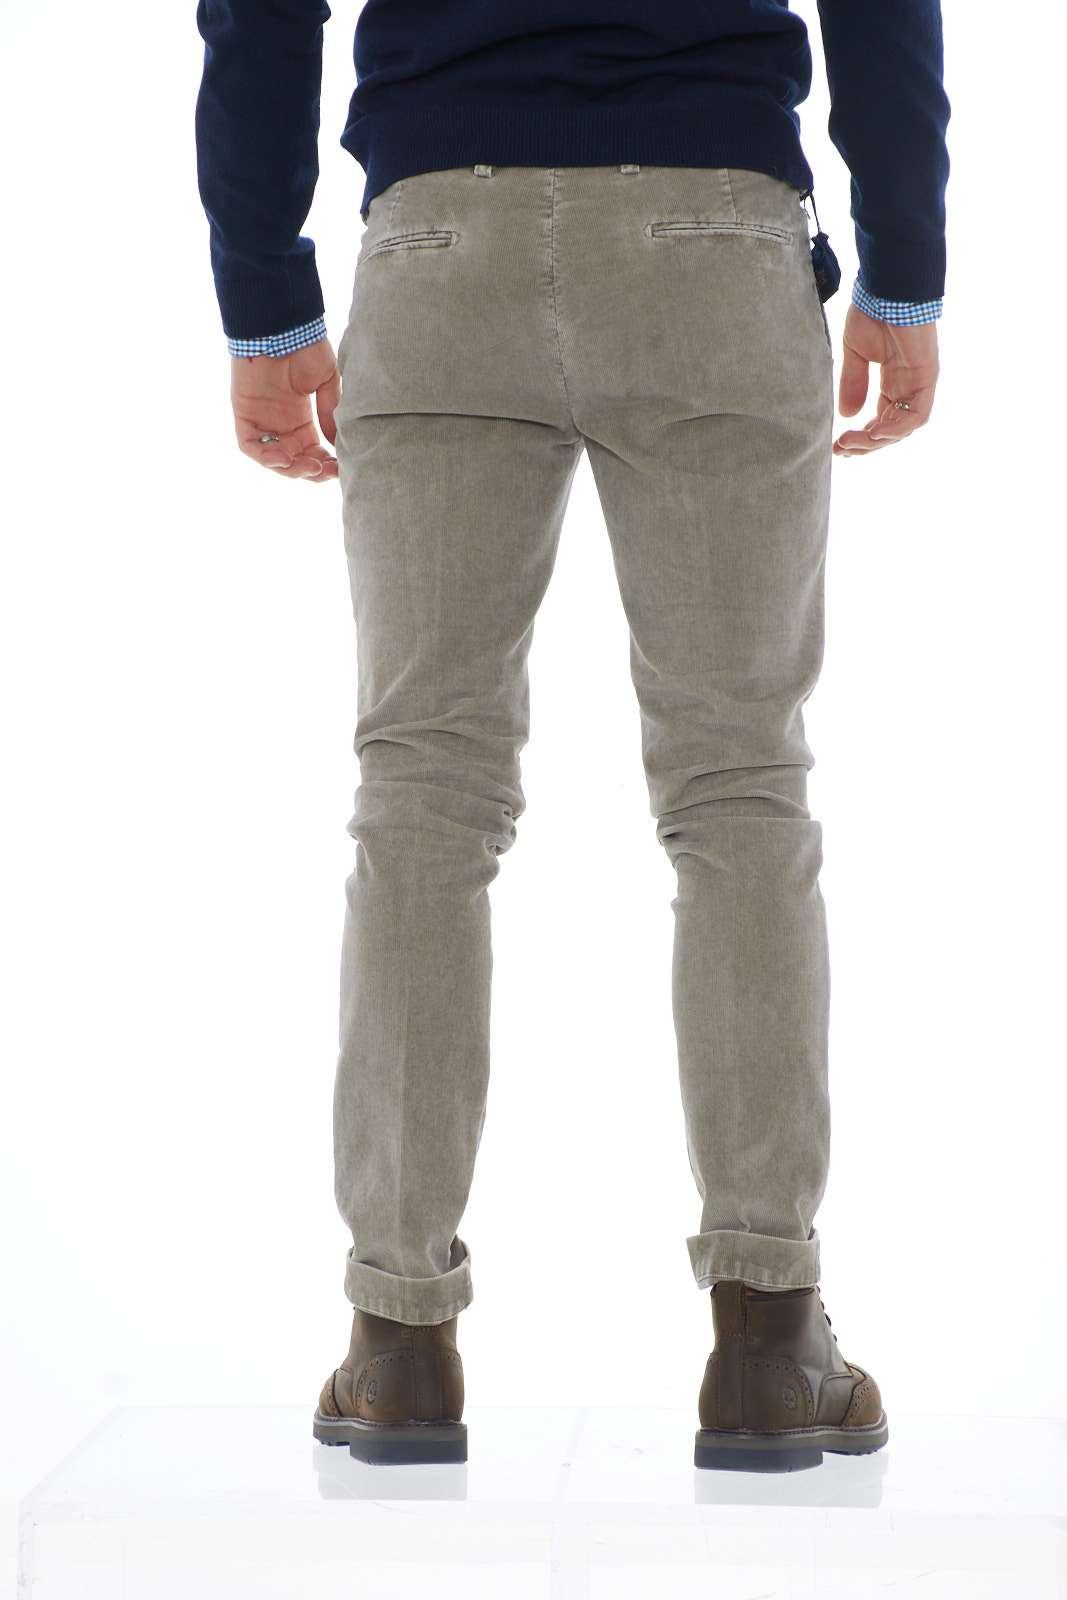 https://www.parmax.com/media/catalog/product/a/i/ai-outlet_parmax-pantaloni-uomo-entre-amis-a1983191001-c.jpg